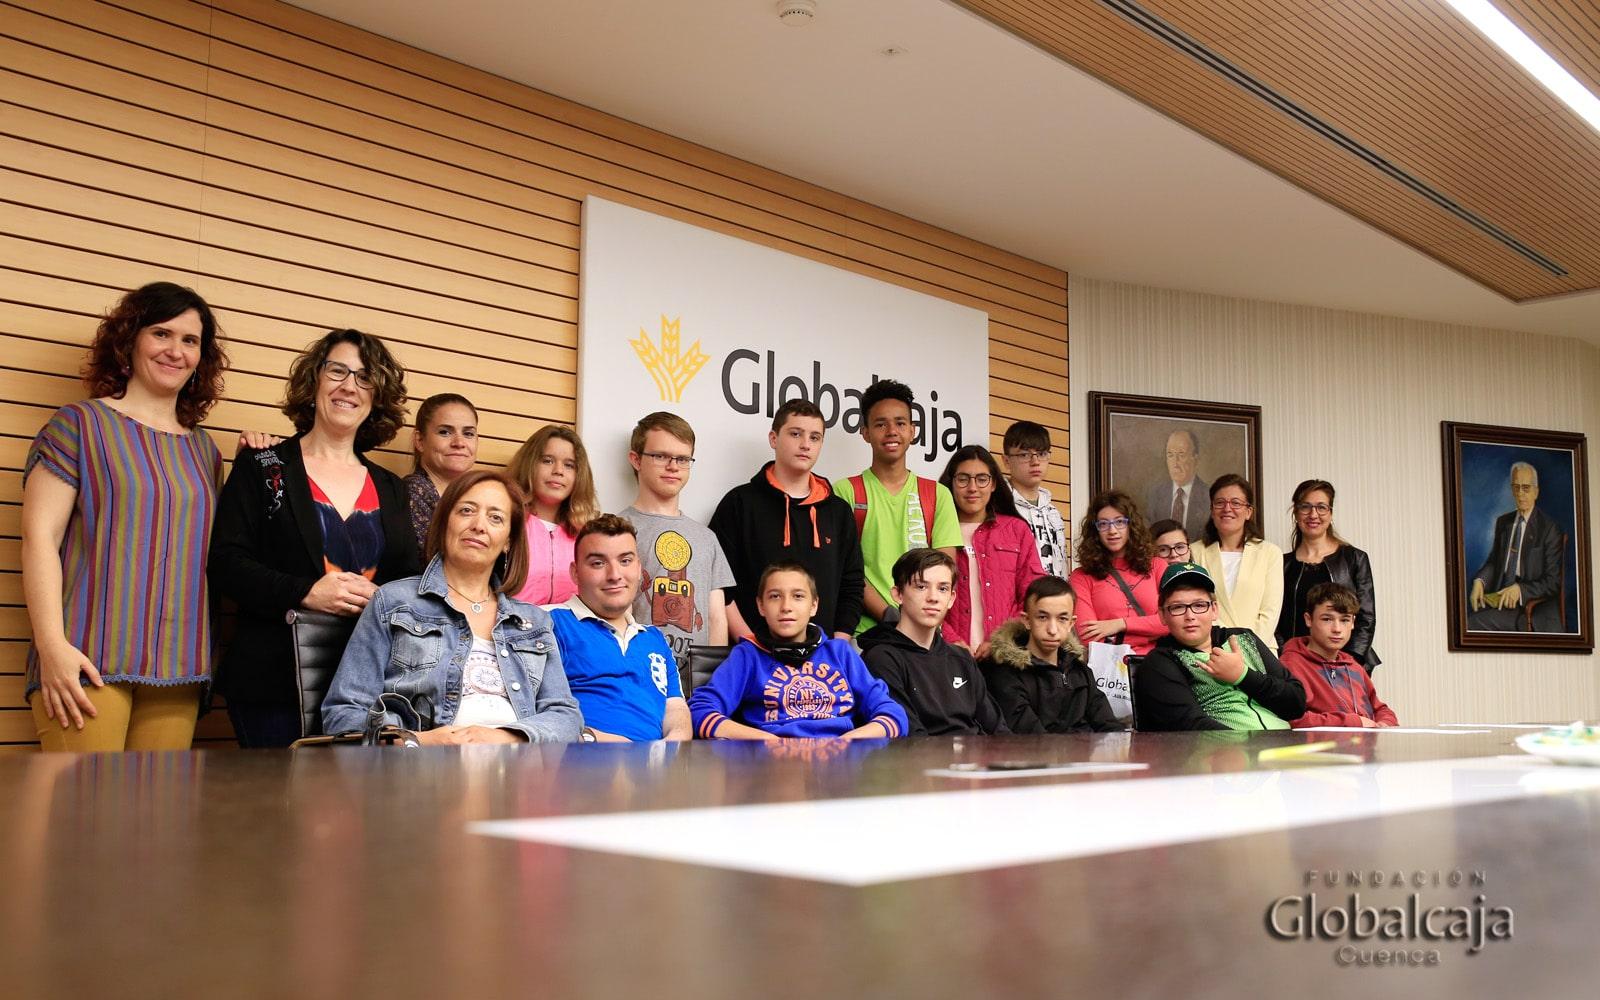 https://blog.globalcaja.es/wp-content/uploads/2019/06/Globalcaja-en-colegios.jpg